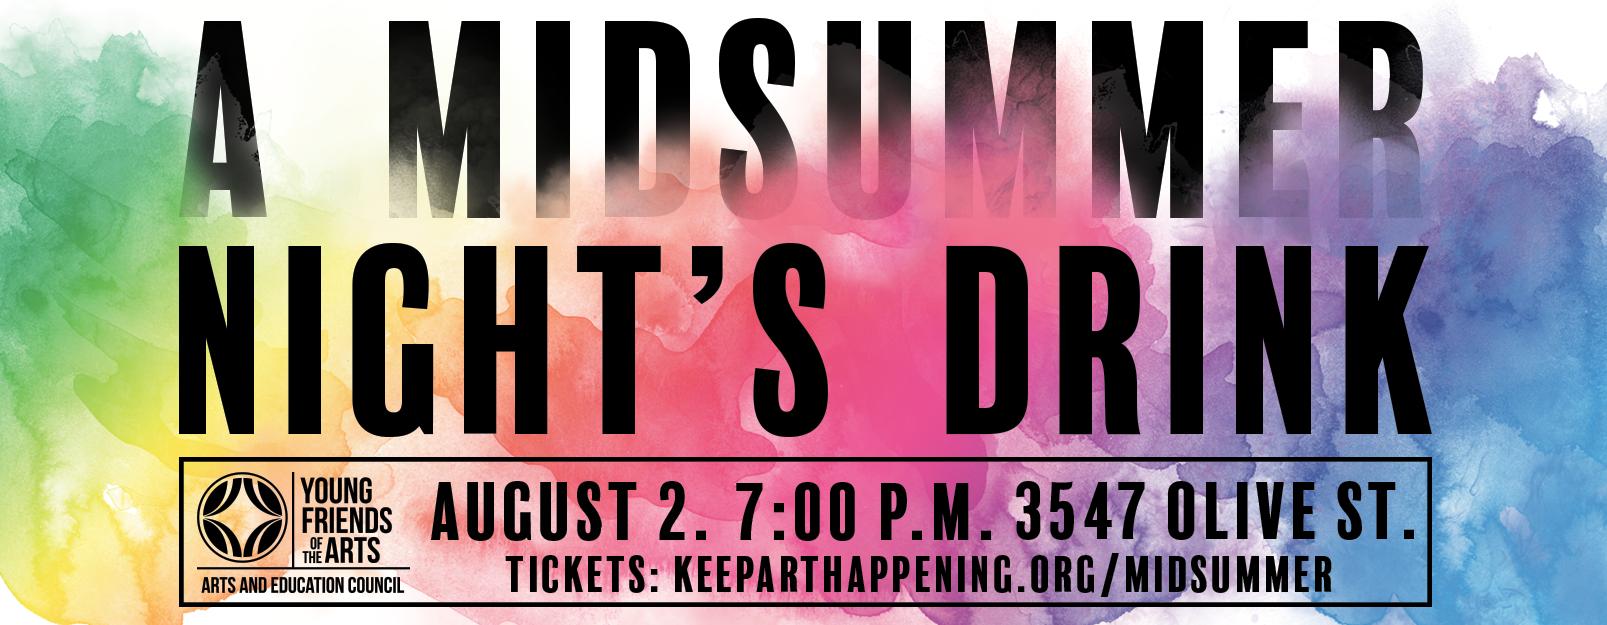 A Midsummer Night's Drink Centene Center for the Arts St. Louis